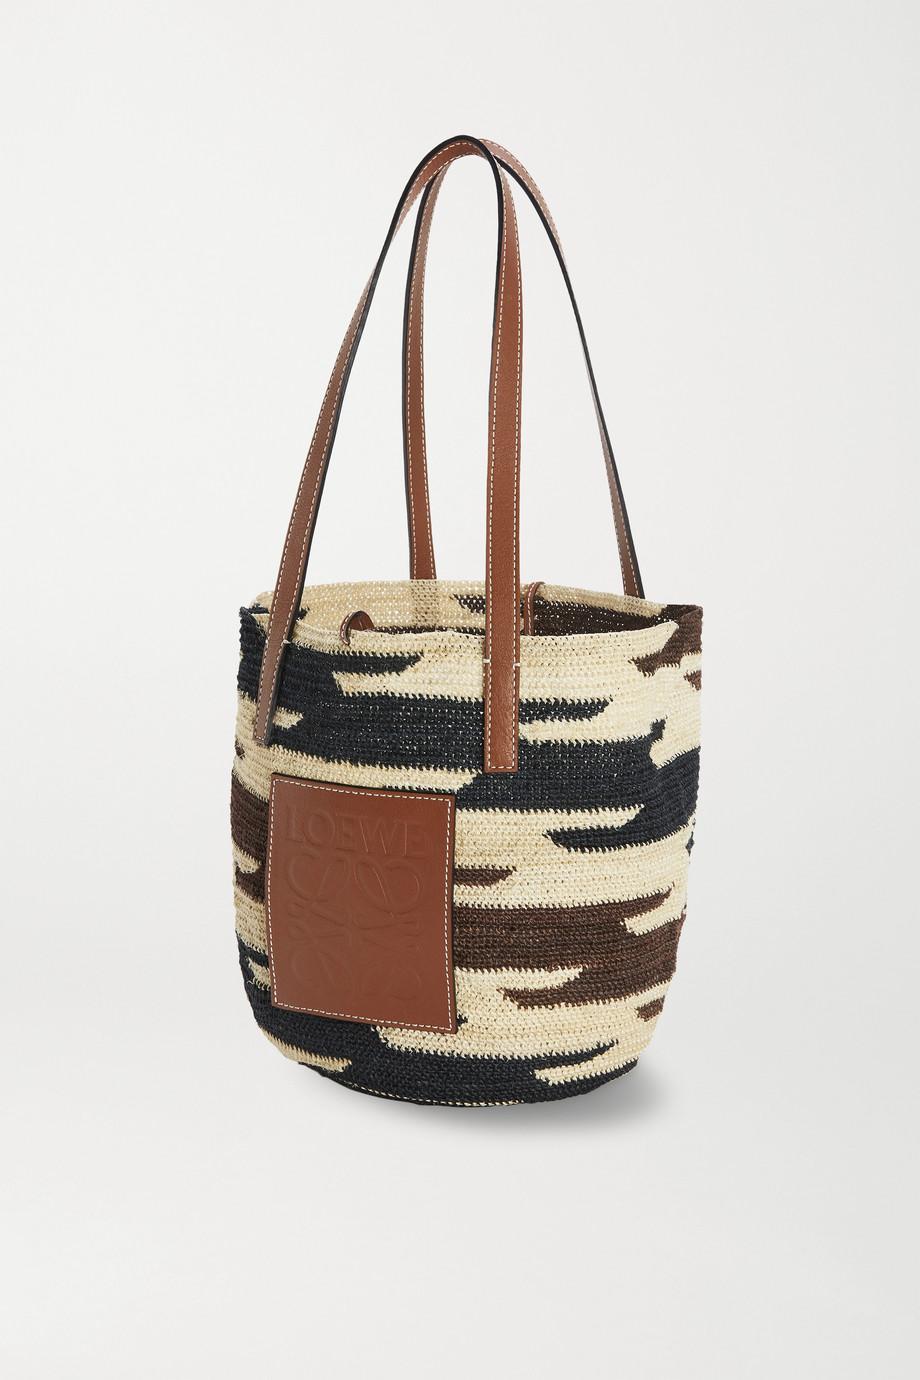 Loewe + Paula's Ibiza Shigra leather-trimmed woven raffia tote